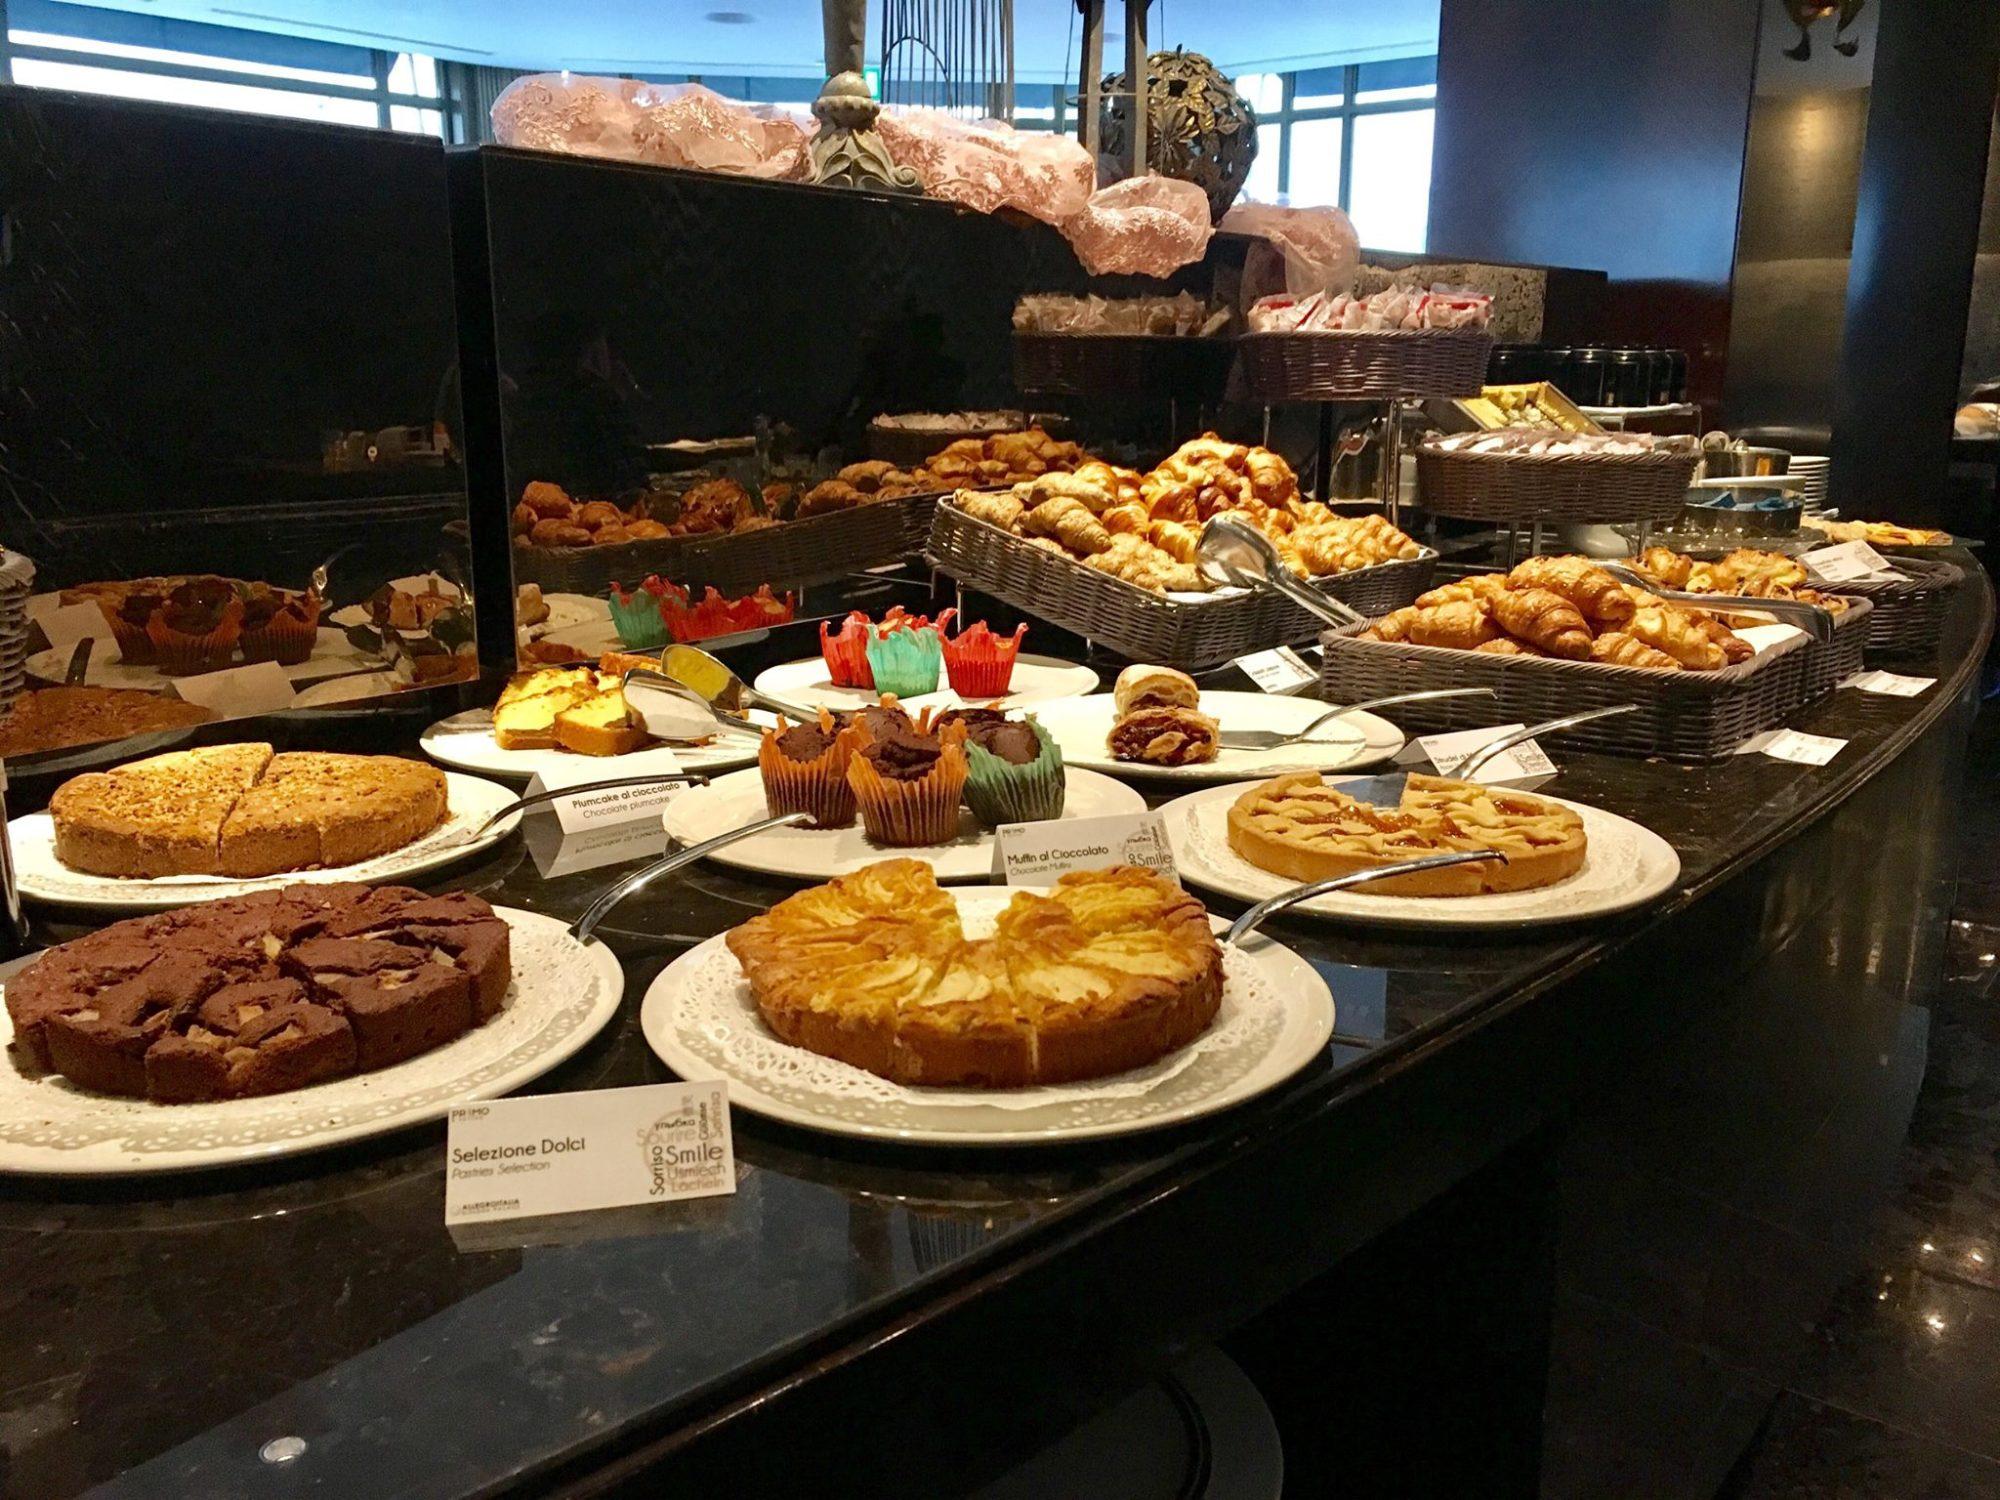 brunch a buffet con torte, croissante muffin